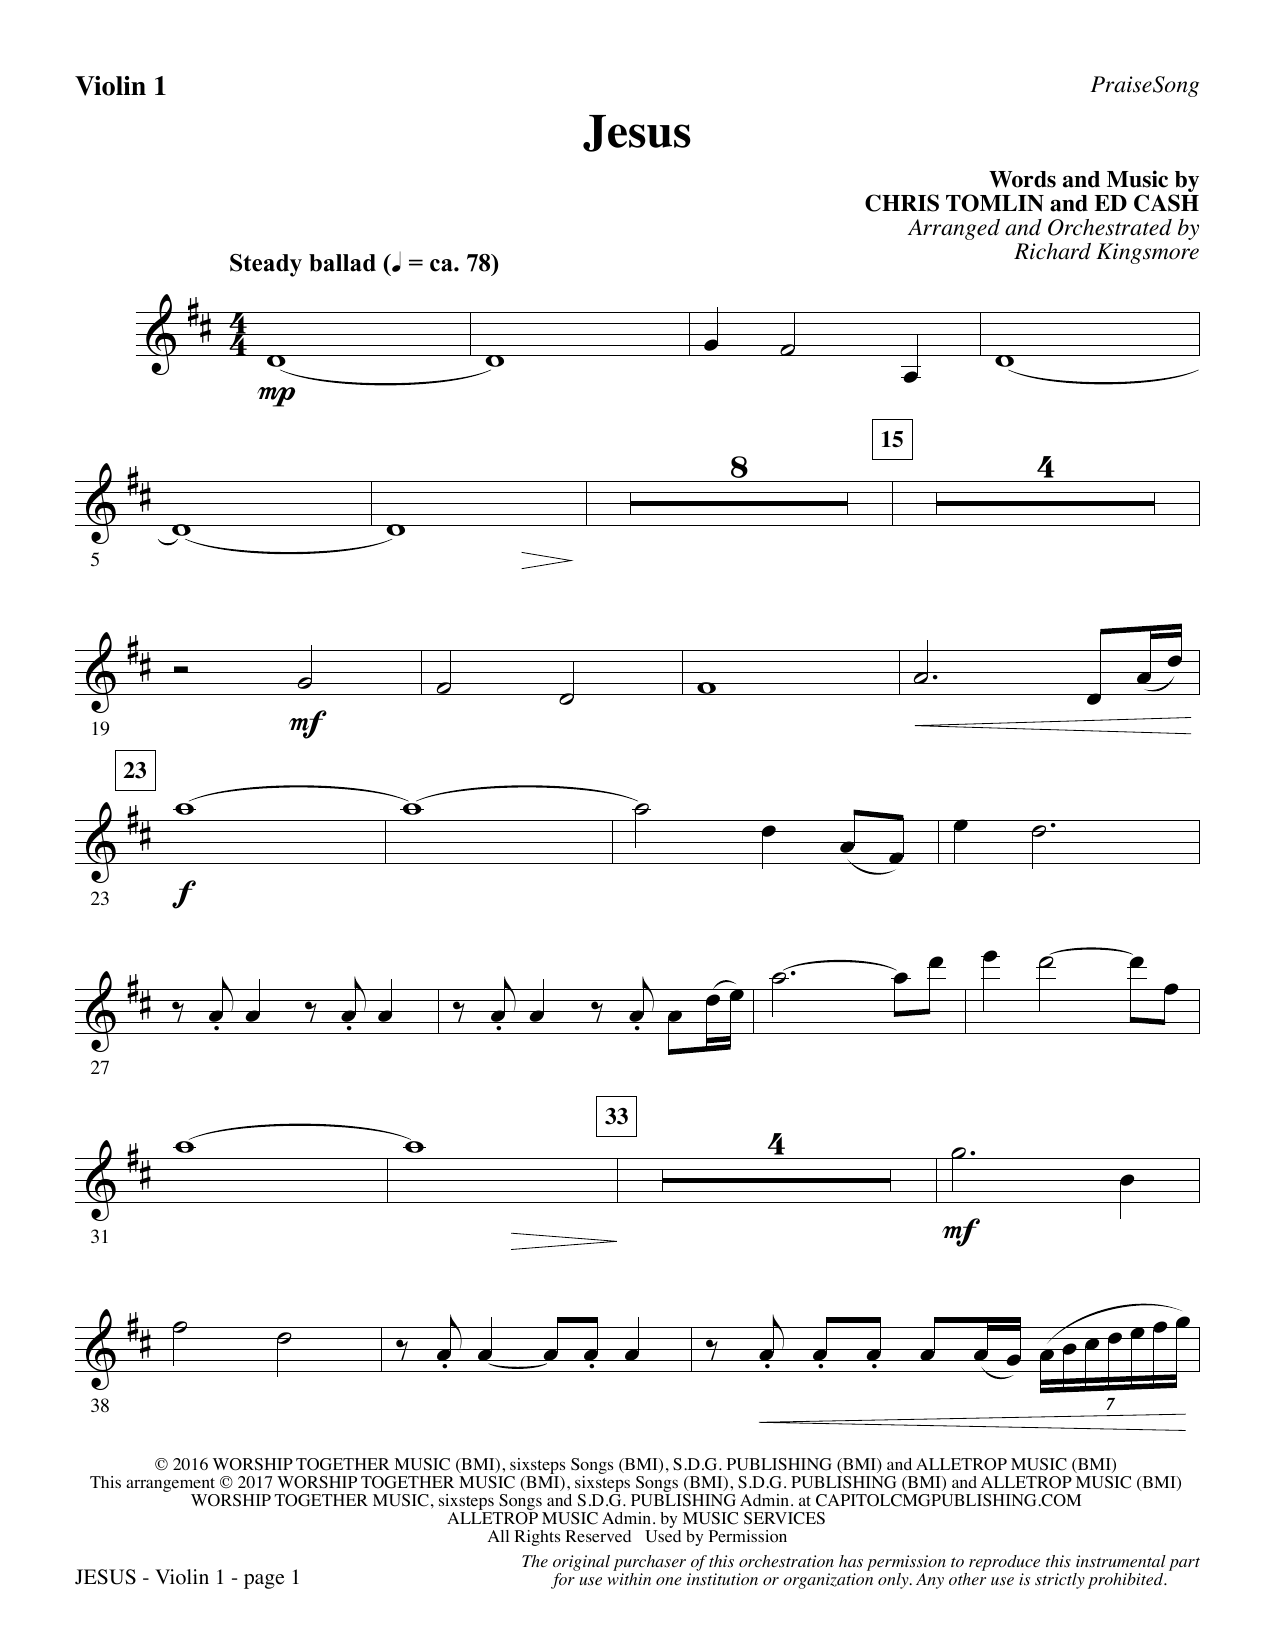 Jesus - Violin 1